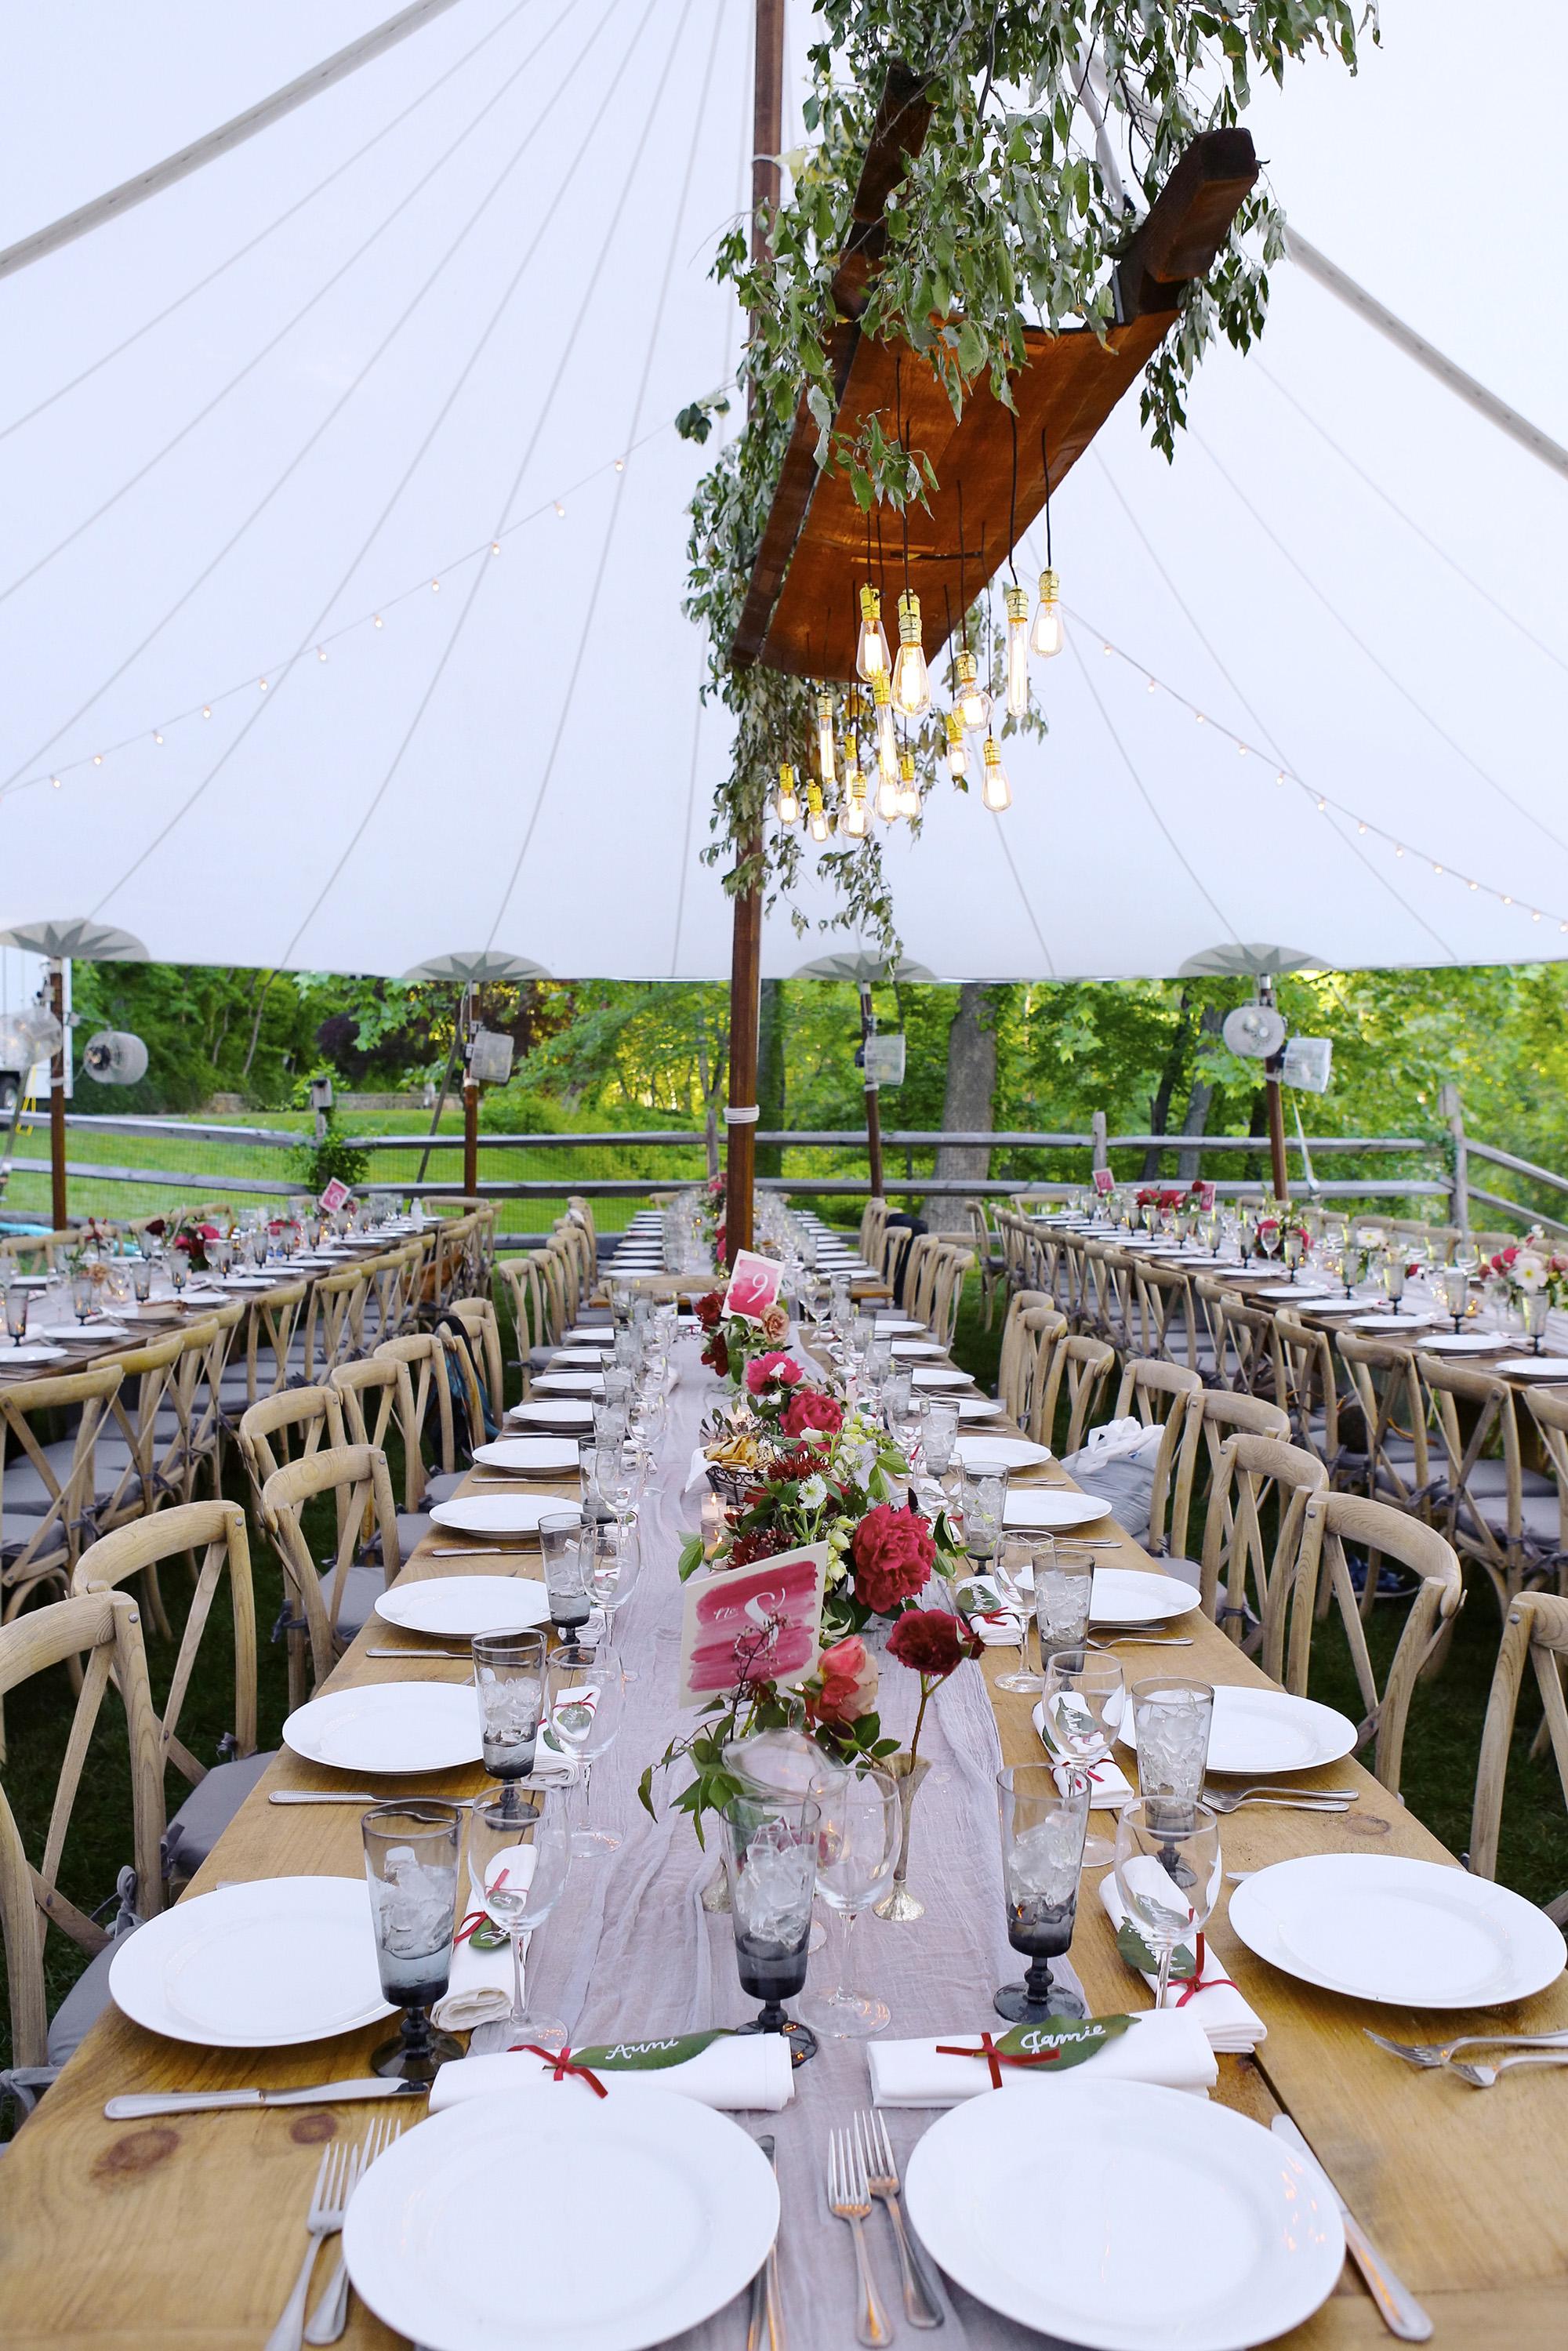 Shannon-Wellington-Delaware-Wedding-Rustic-Home-Wedding13.jpg